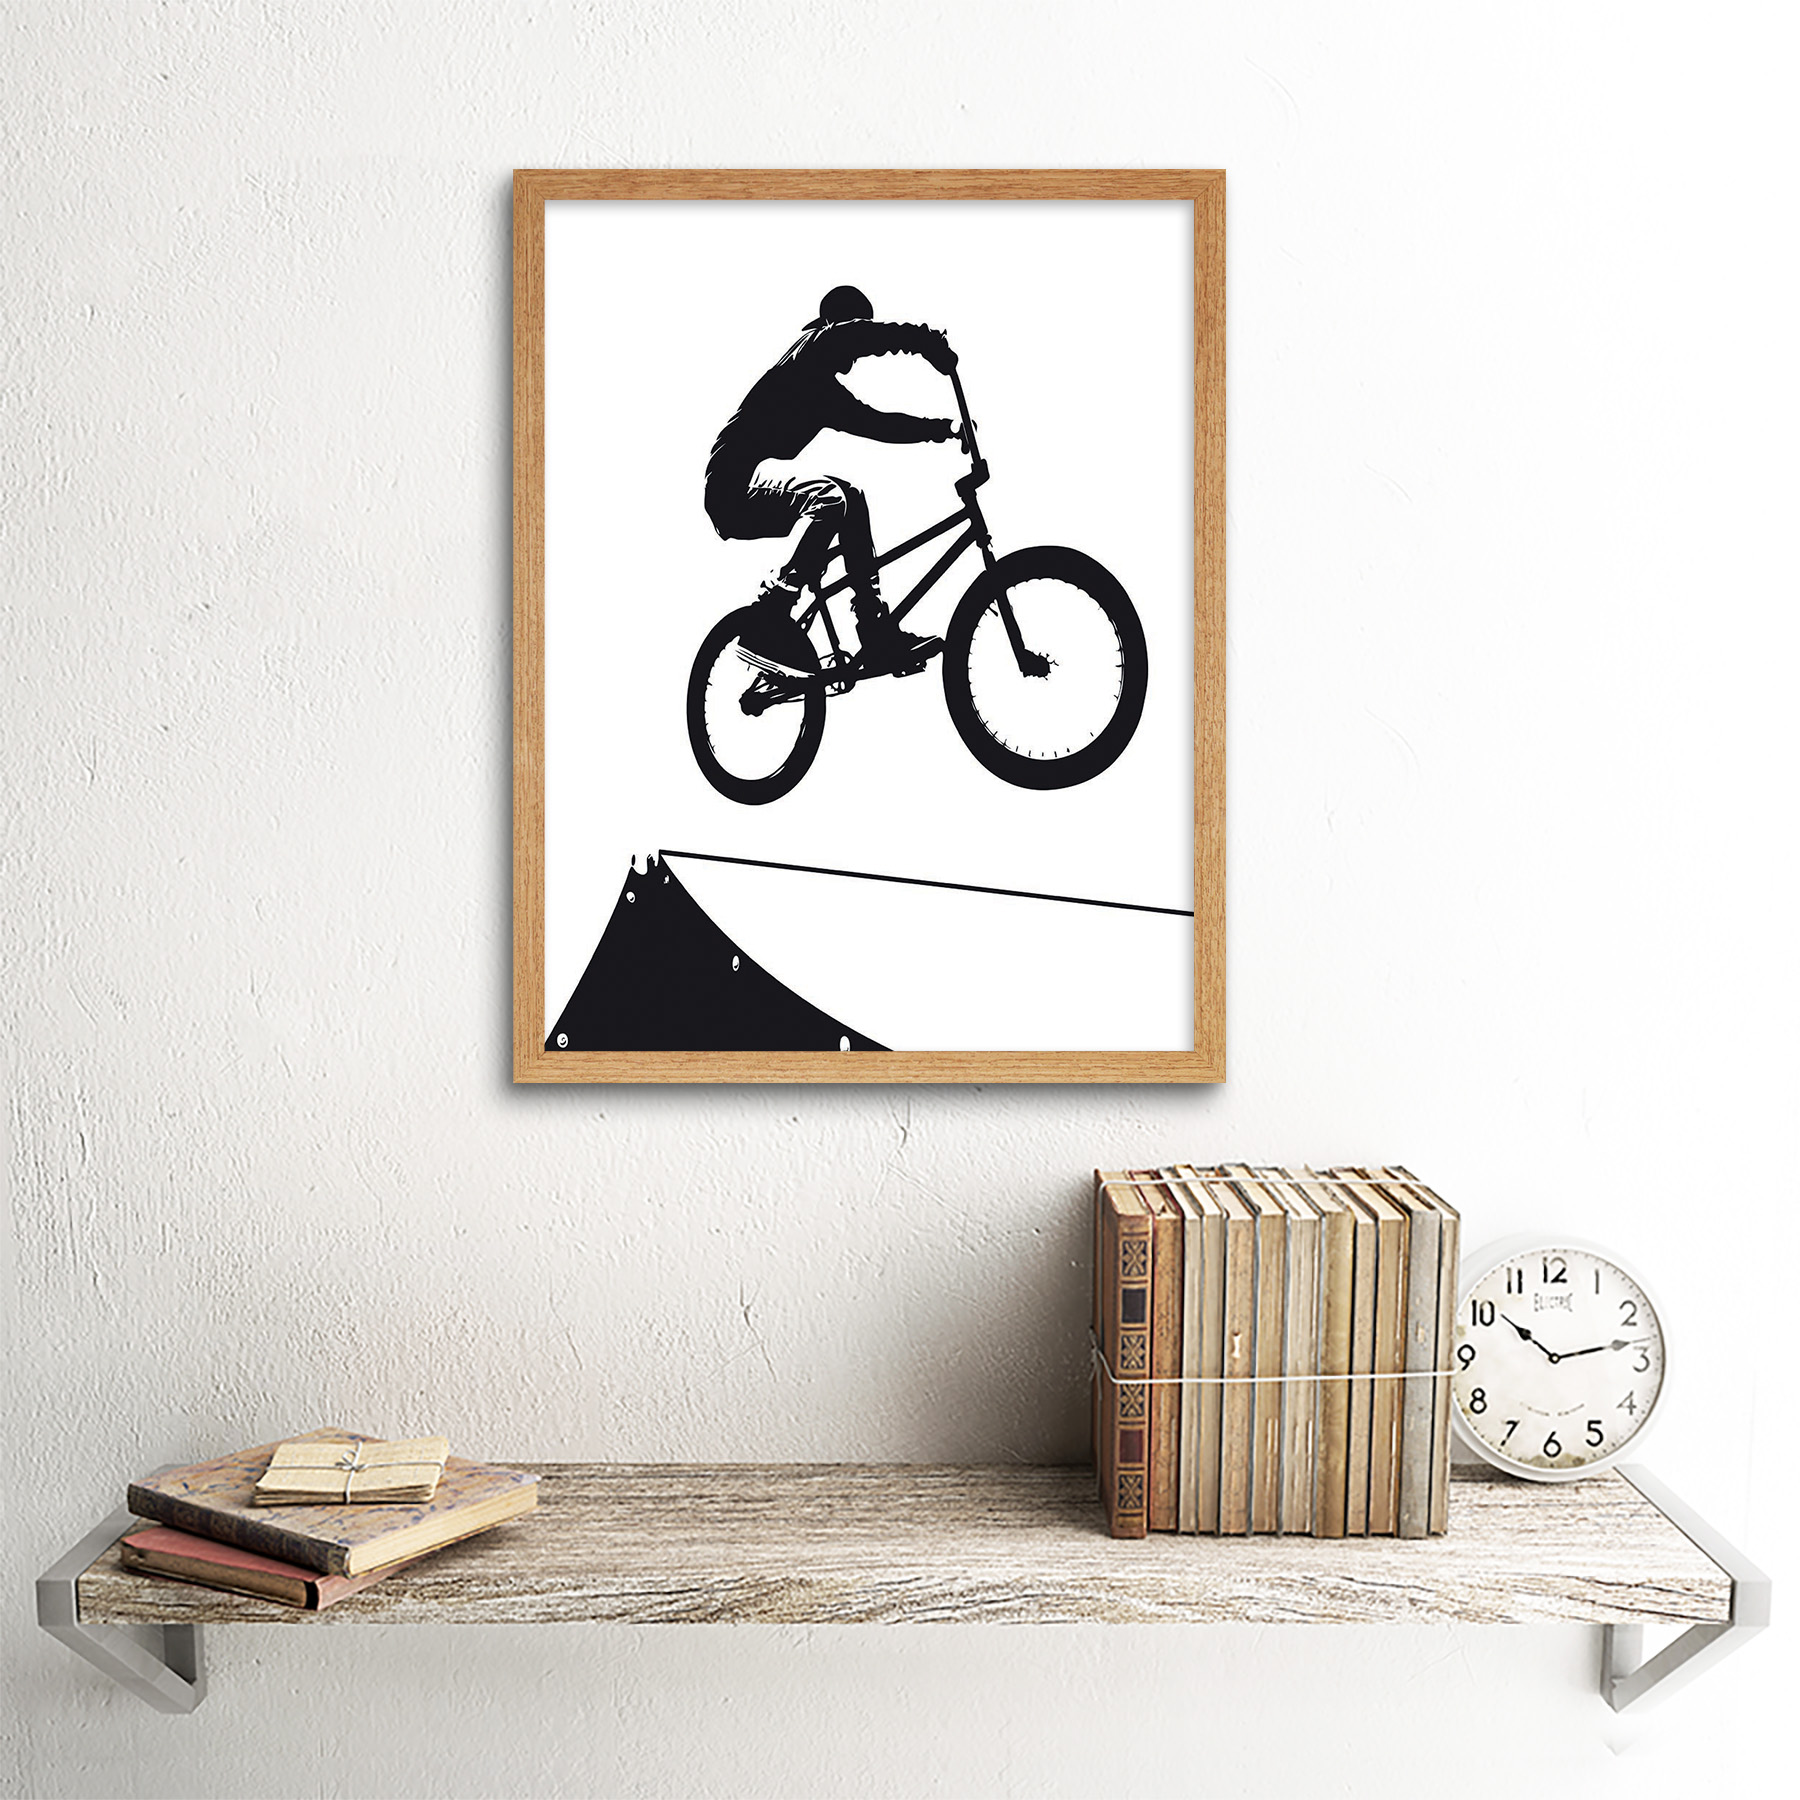 Indexbild 13 - Painting Sport Bmx Bike Bicycle Jump Air Ramp Black White 12X16 Framed Art Print